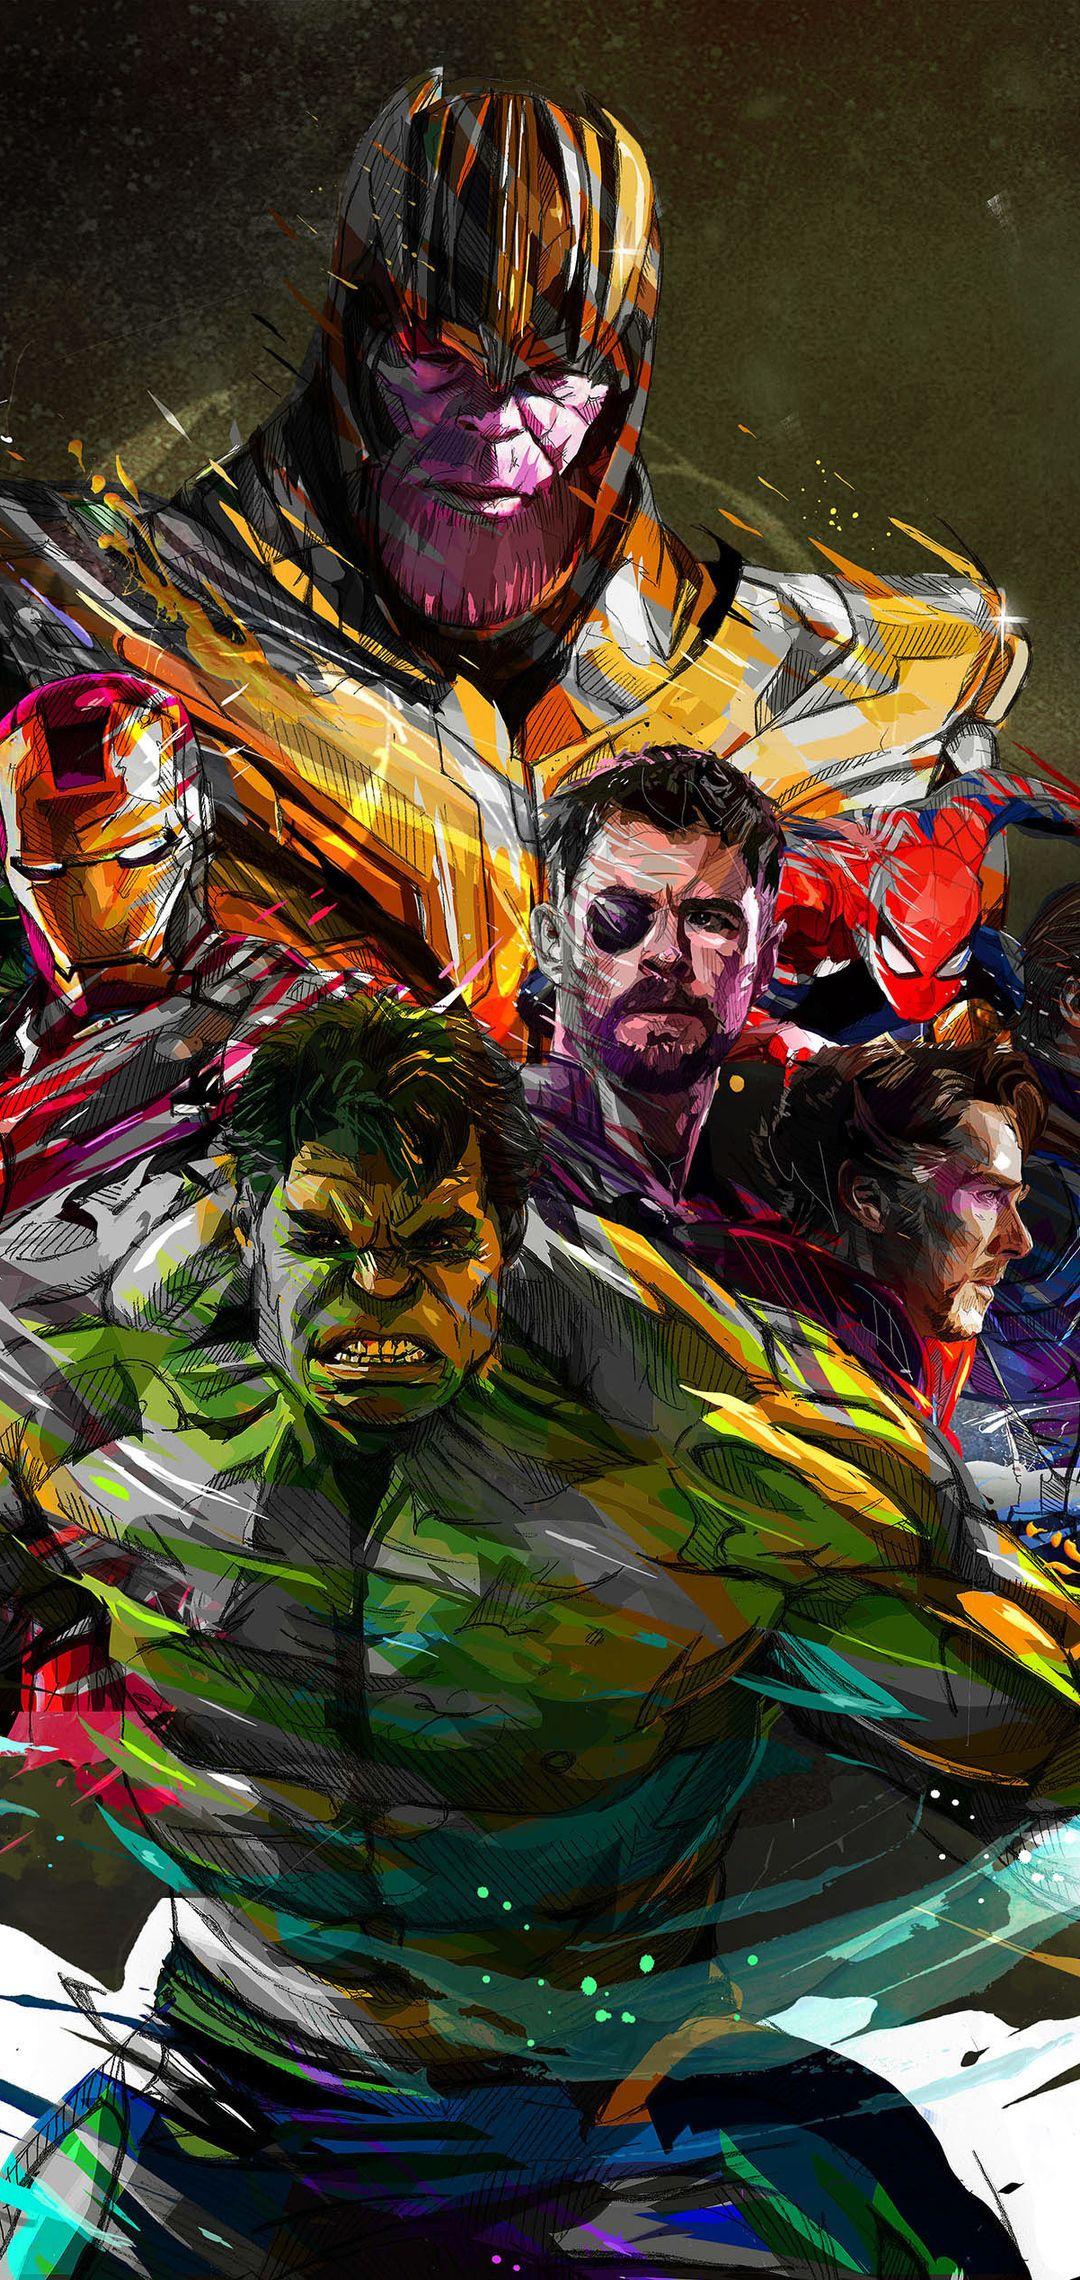 1080x2280 Marvel Avengers One Plus 6 Huawei P20 Honor View 10 Vivo Y85 Oppo F7 Xiaomi Mi A2 Hd 4k Wallp Marvel Comics Wallpaper Avengers Art Avengers Wallpaper